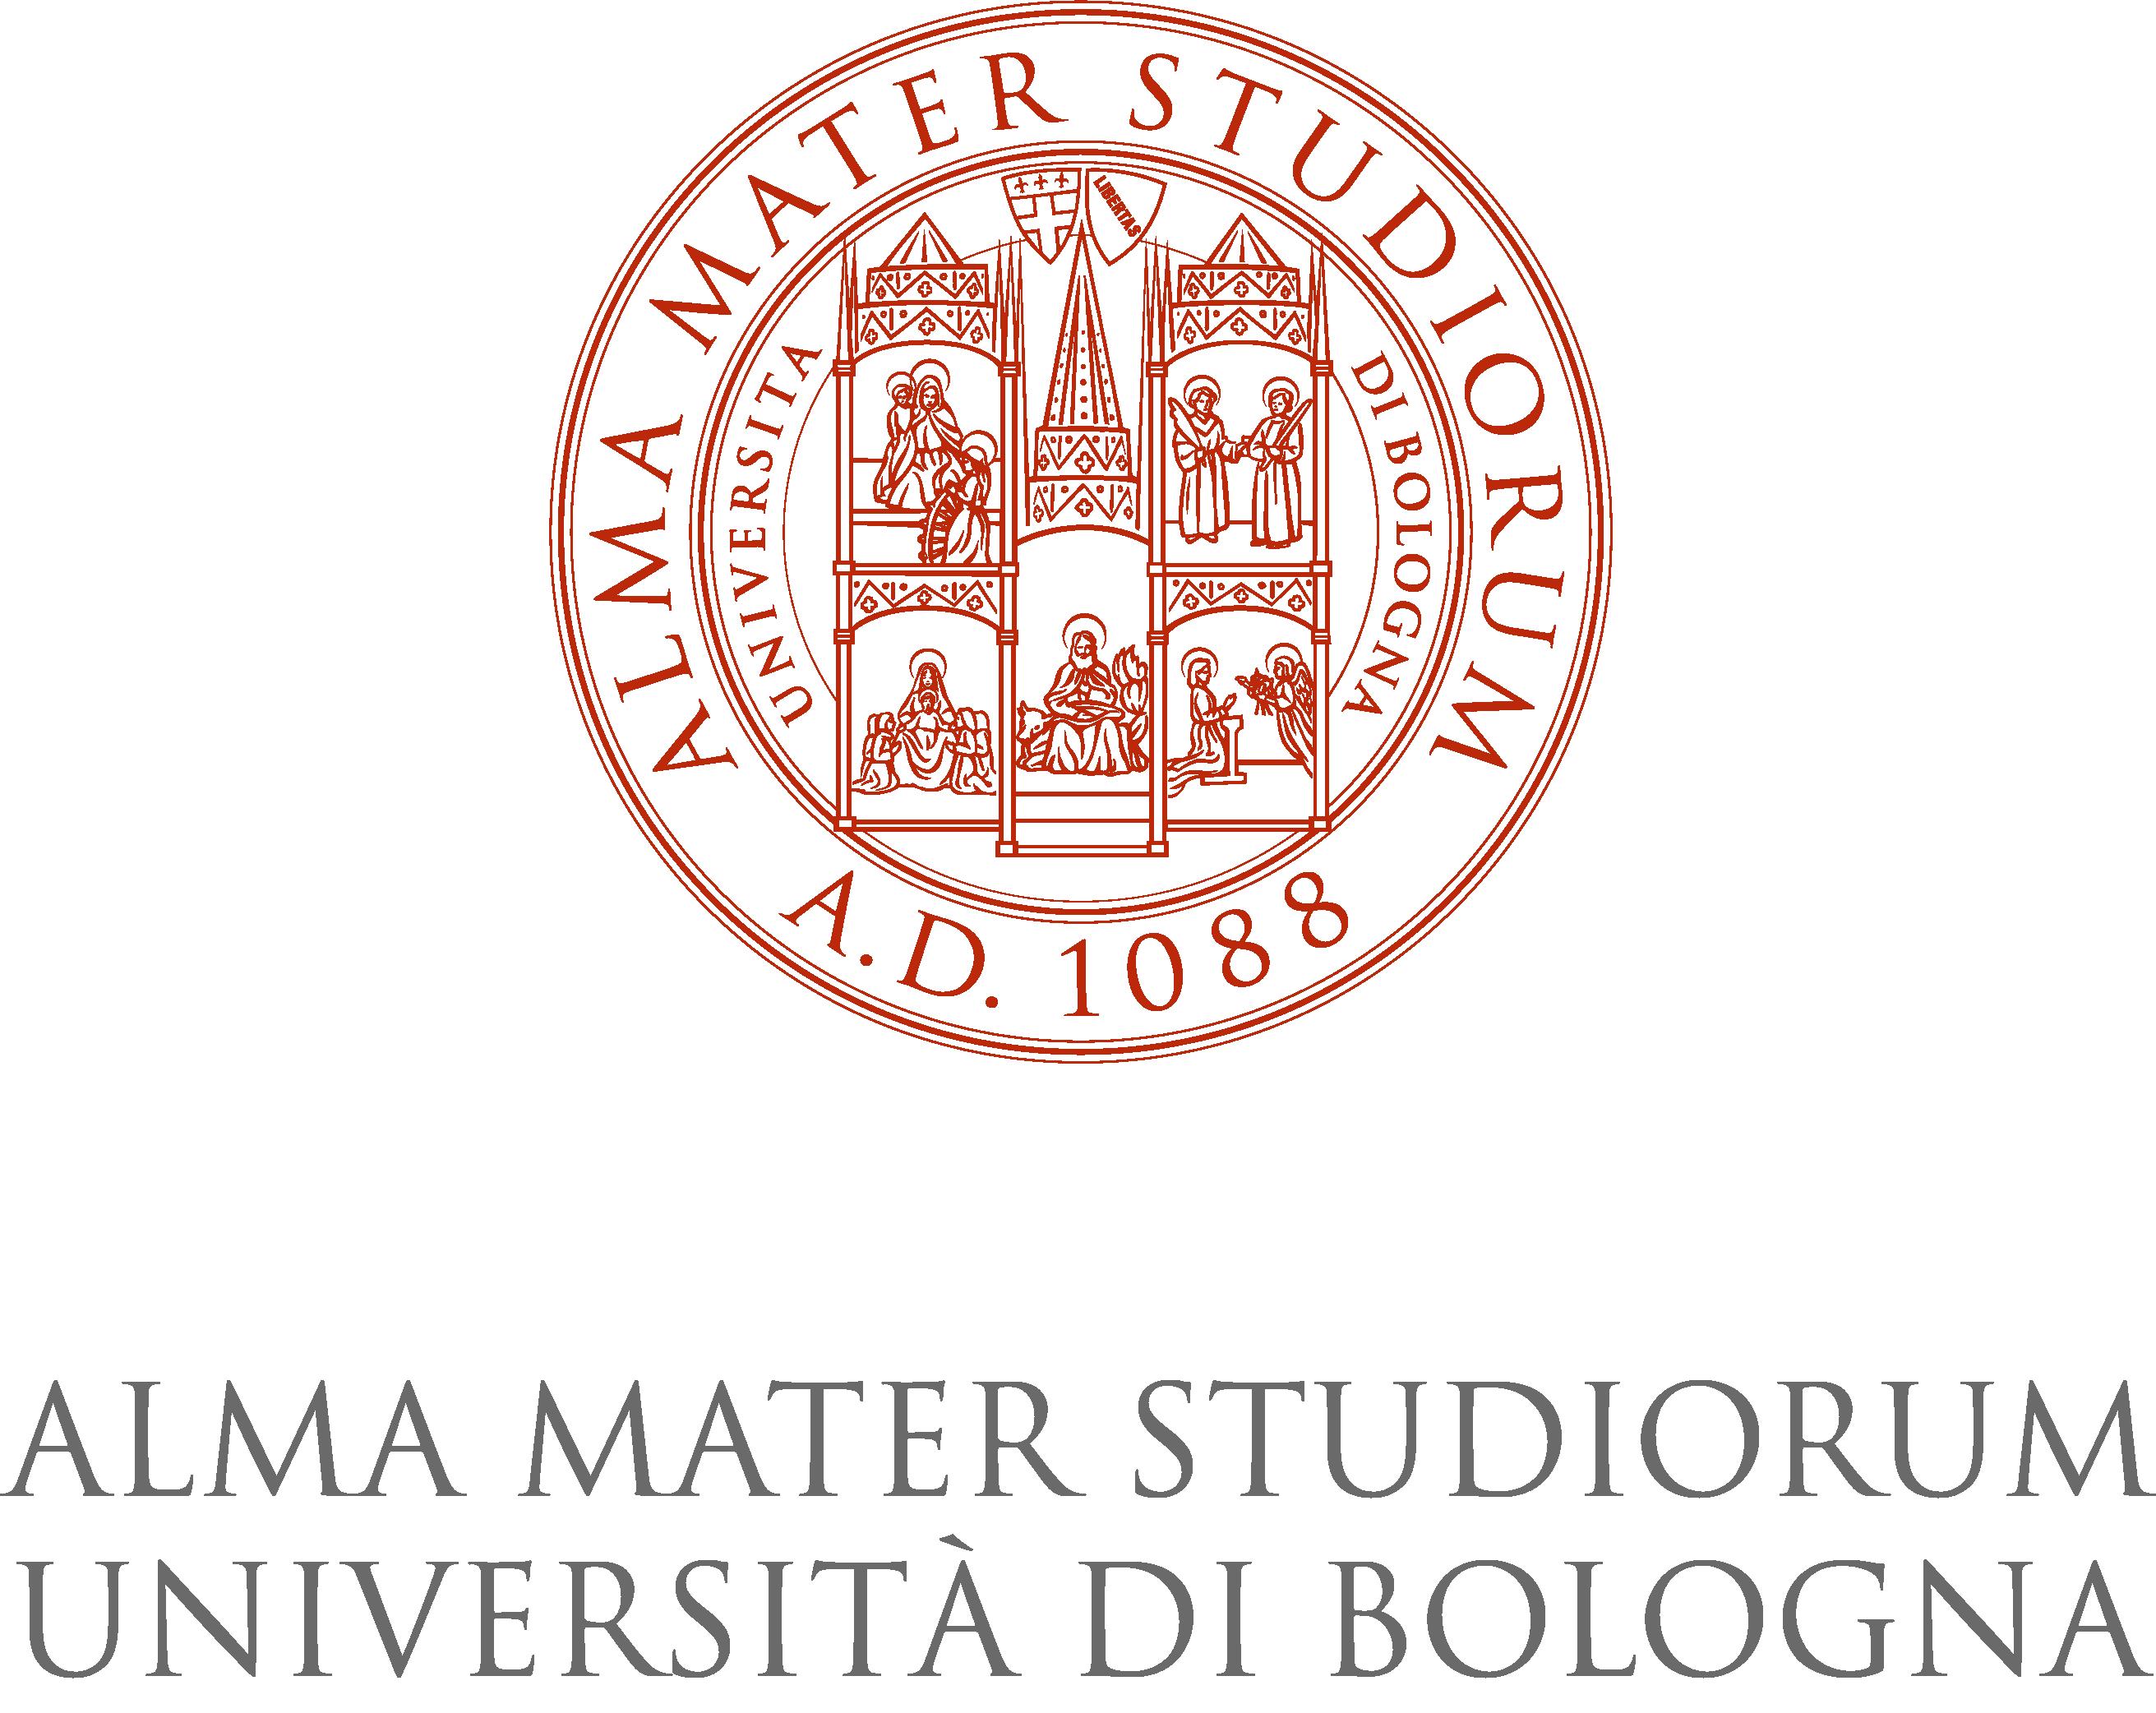 LOGO ALMA MATER STUDIORUM UNIVERSITA' DI BOLOGNA